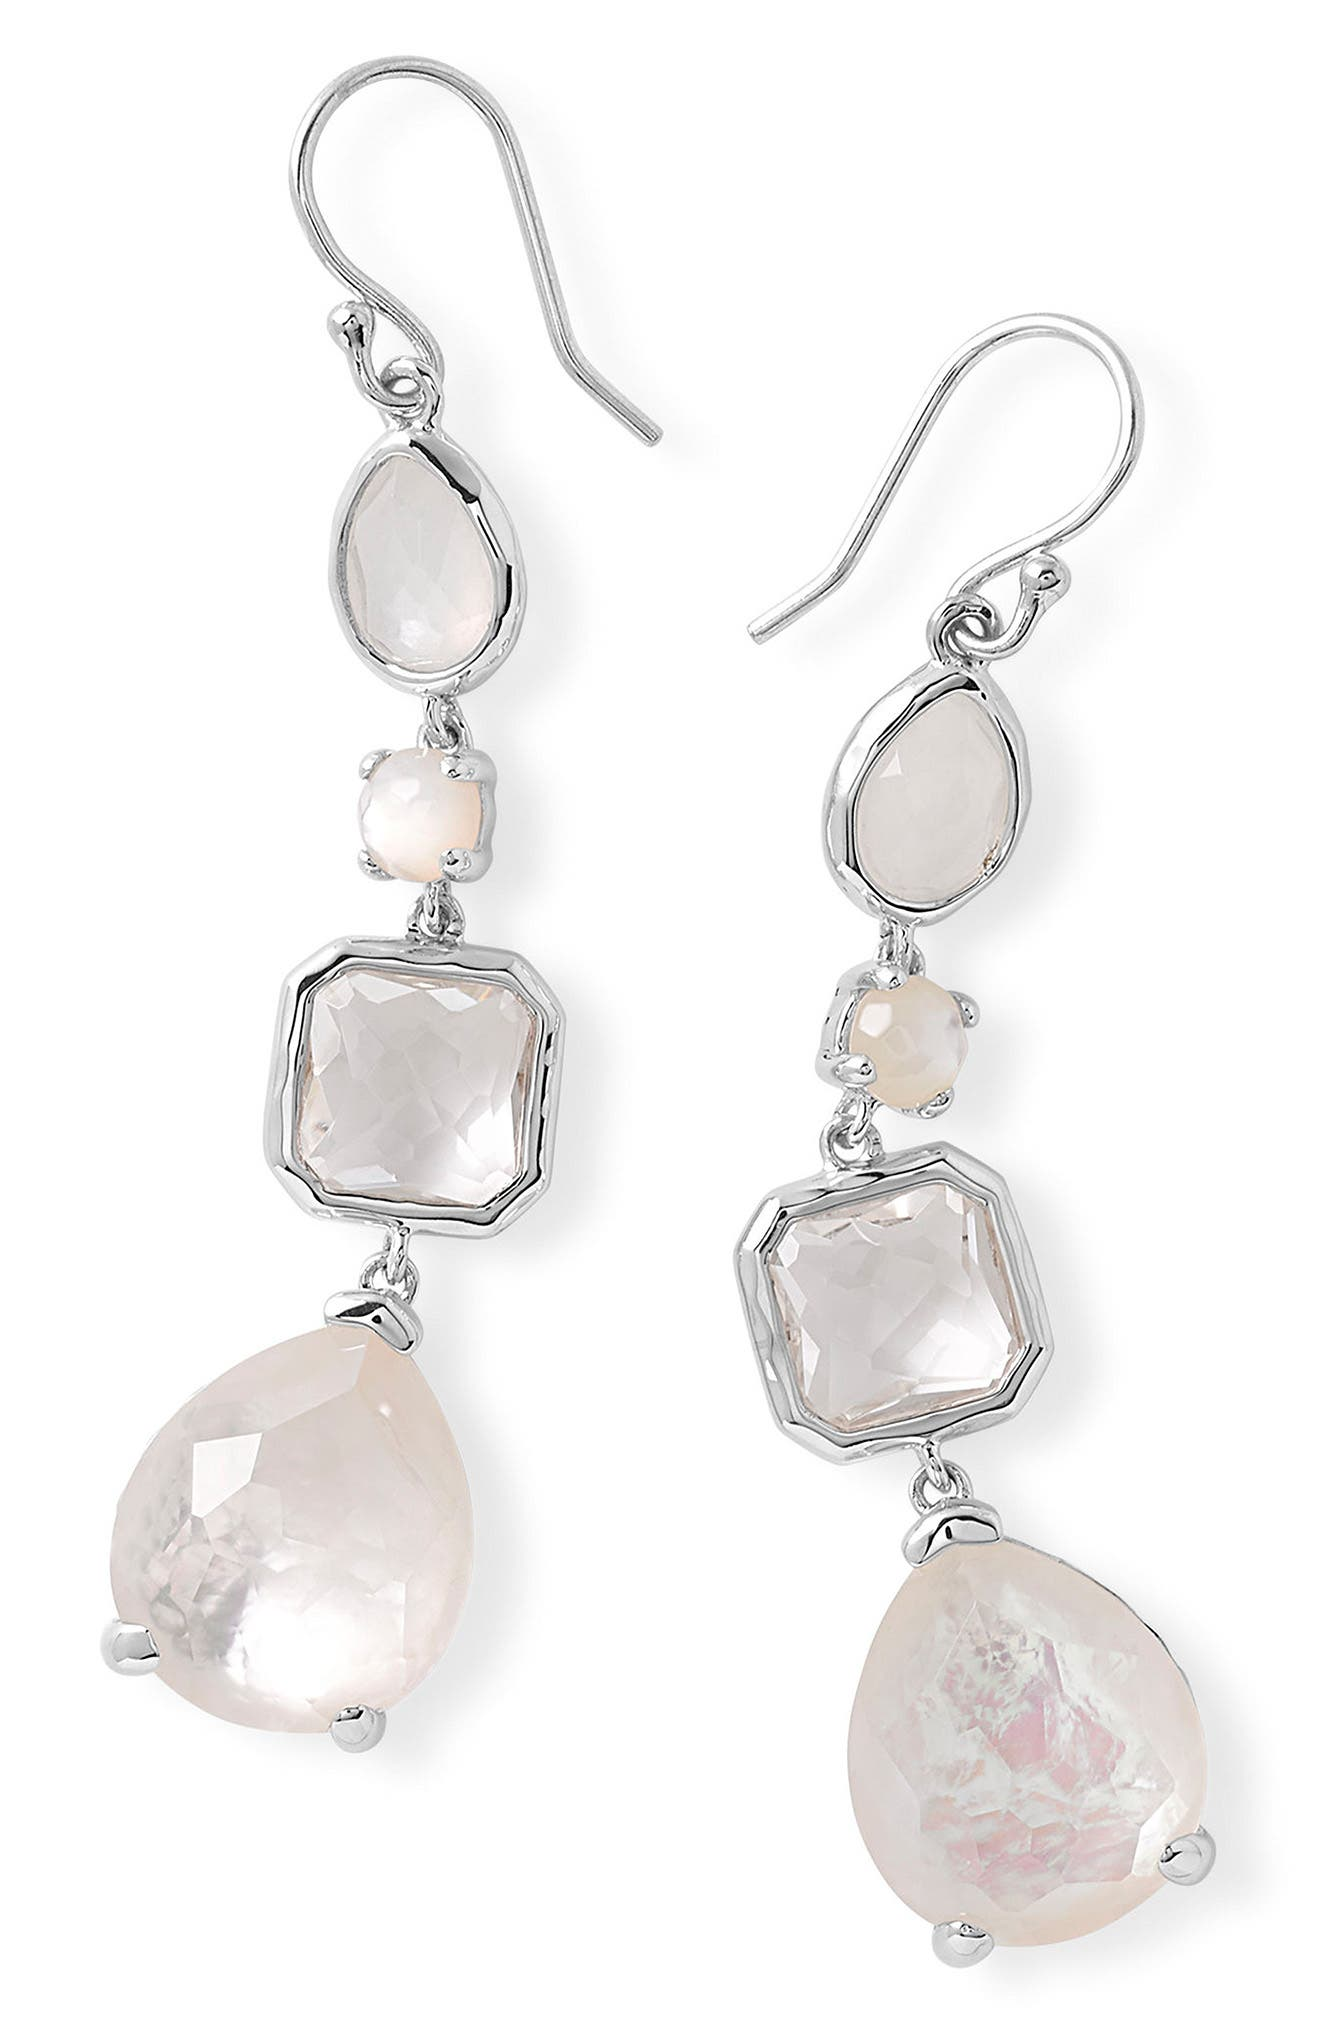 'Rock Candy' Semiprecious Stone Linear Drop Earrings,                             Alternate thumbnail 3, color,                             Silver/ Flirt